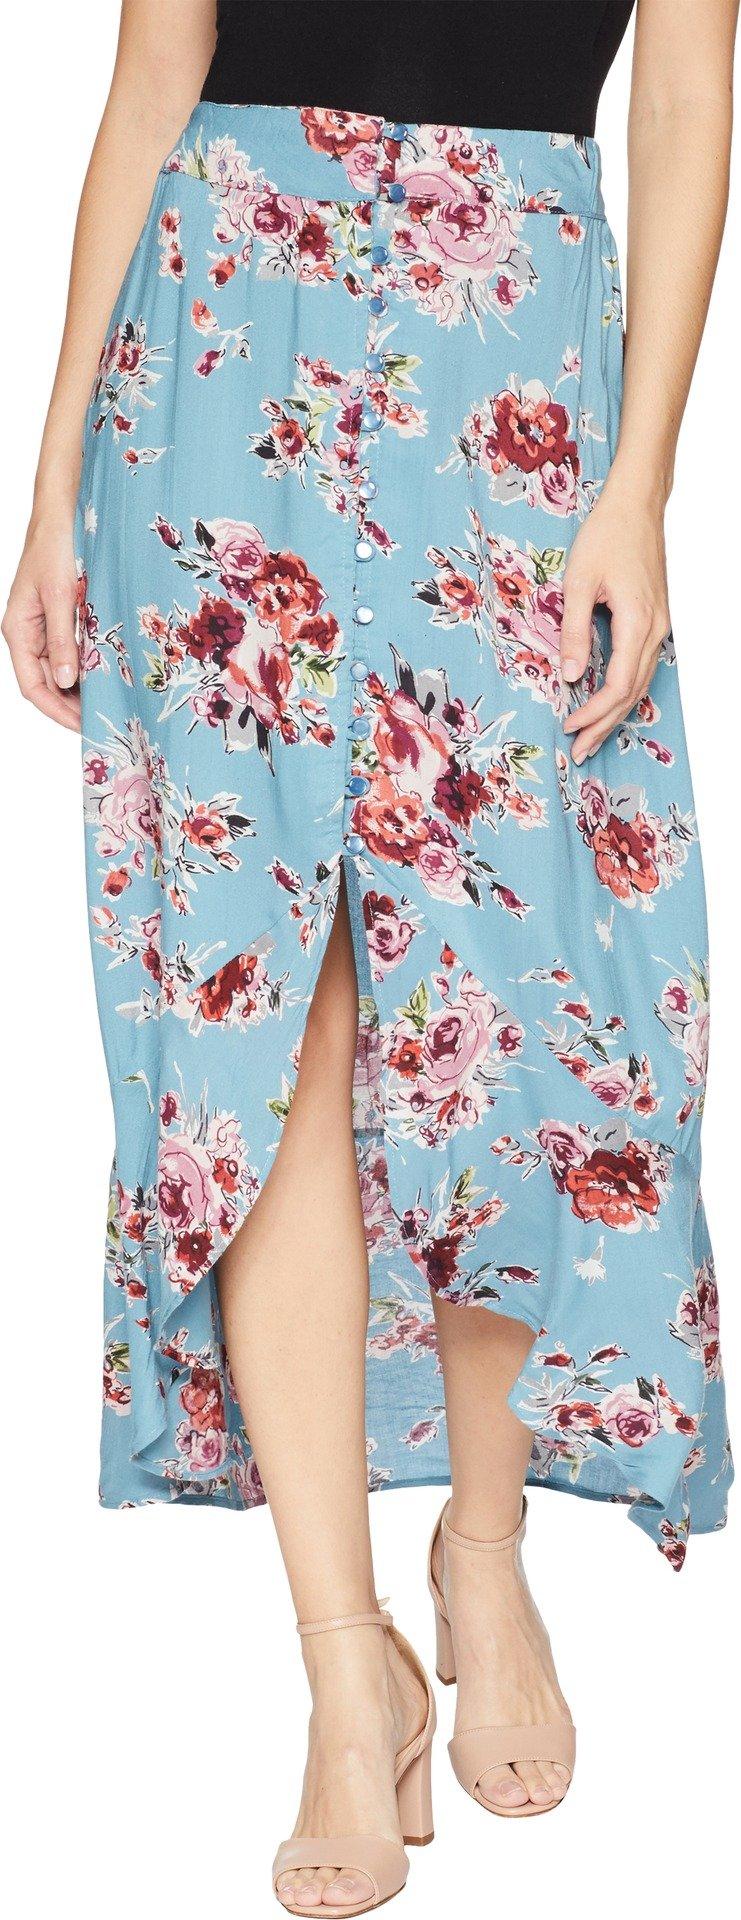 Angie Women's Button Front Ruffle Hem Skirt, Blue, Large